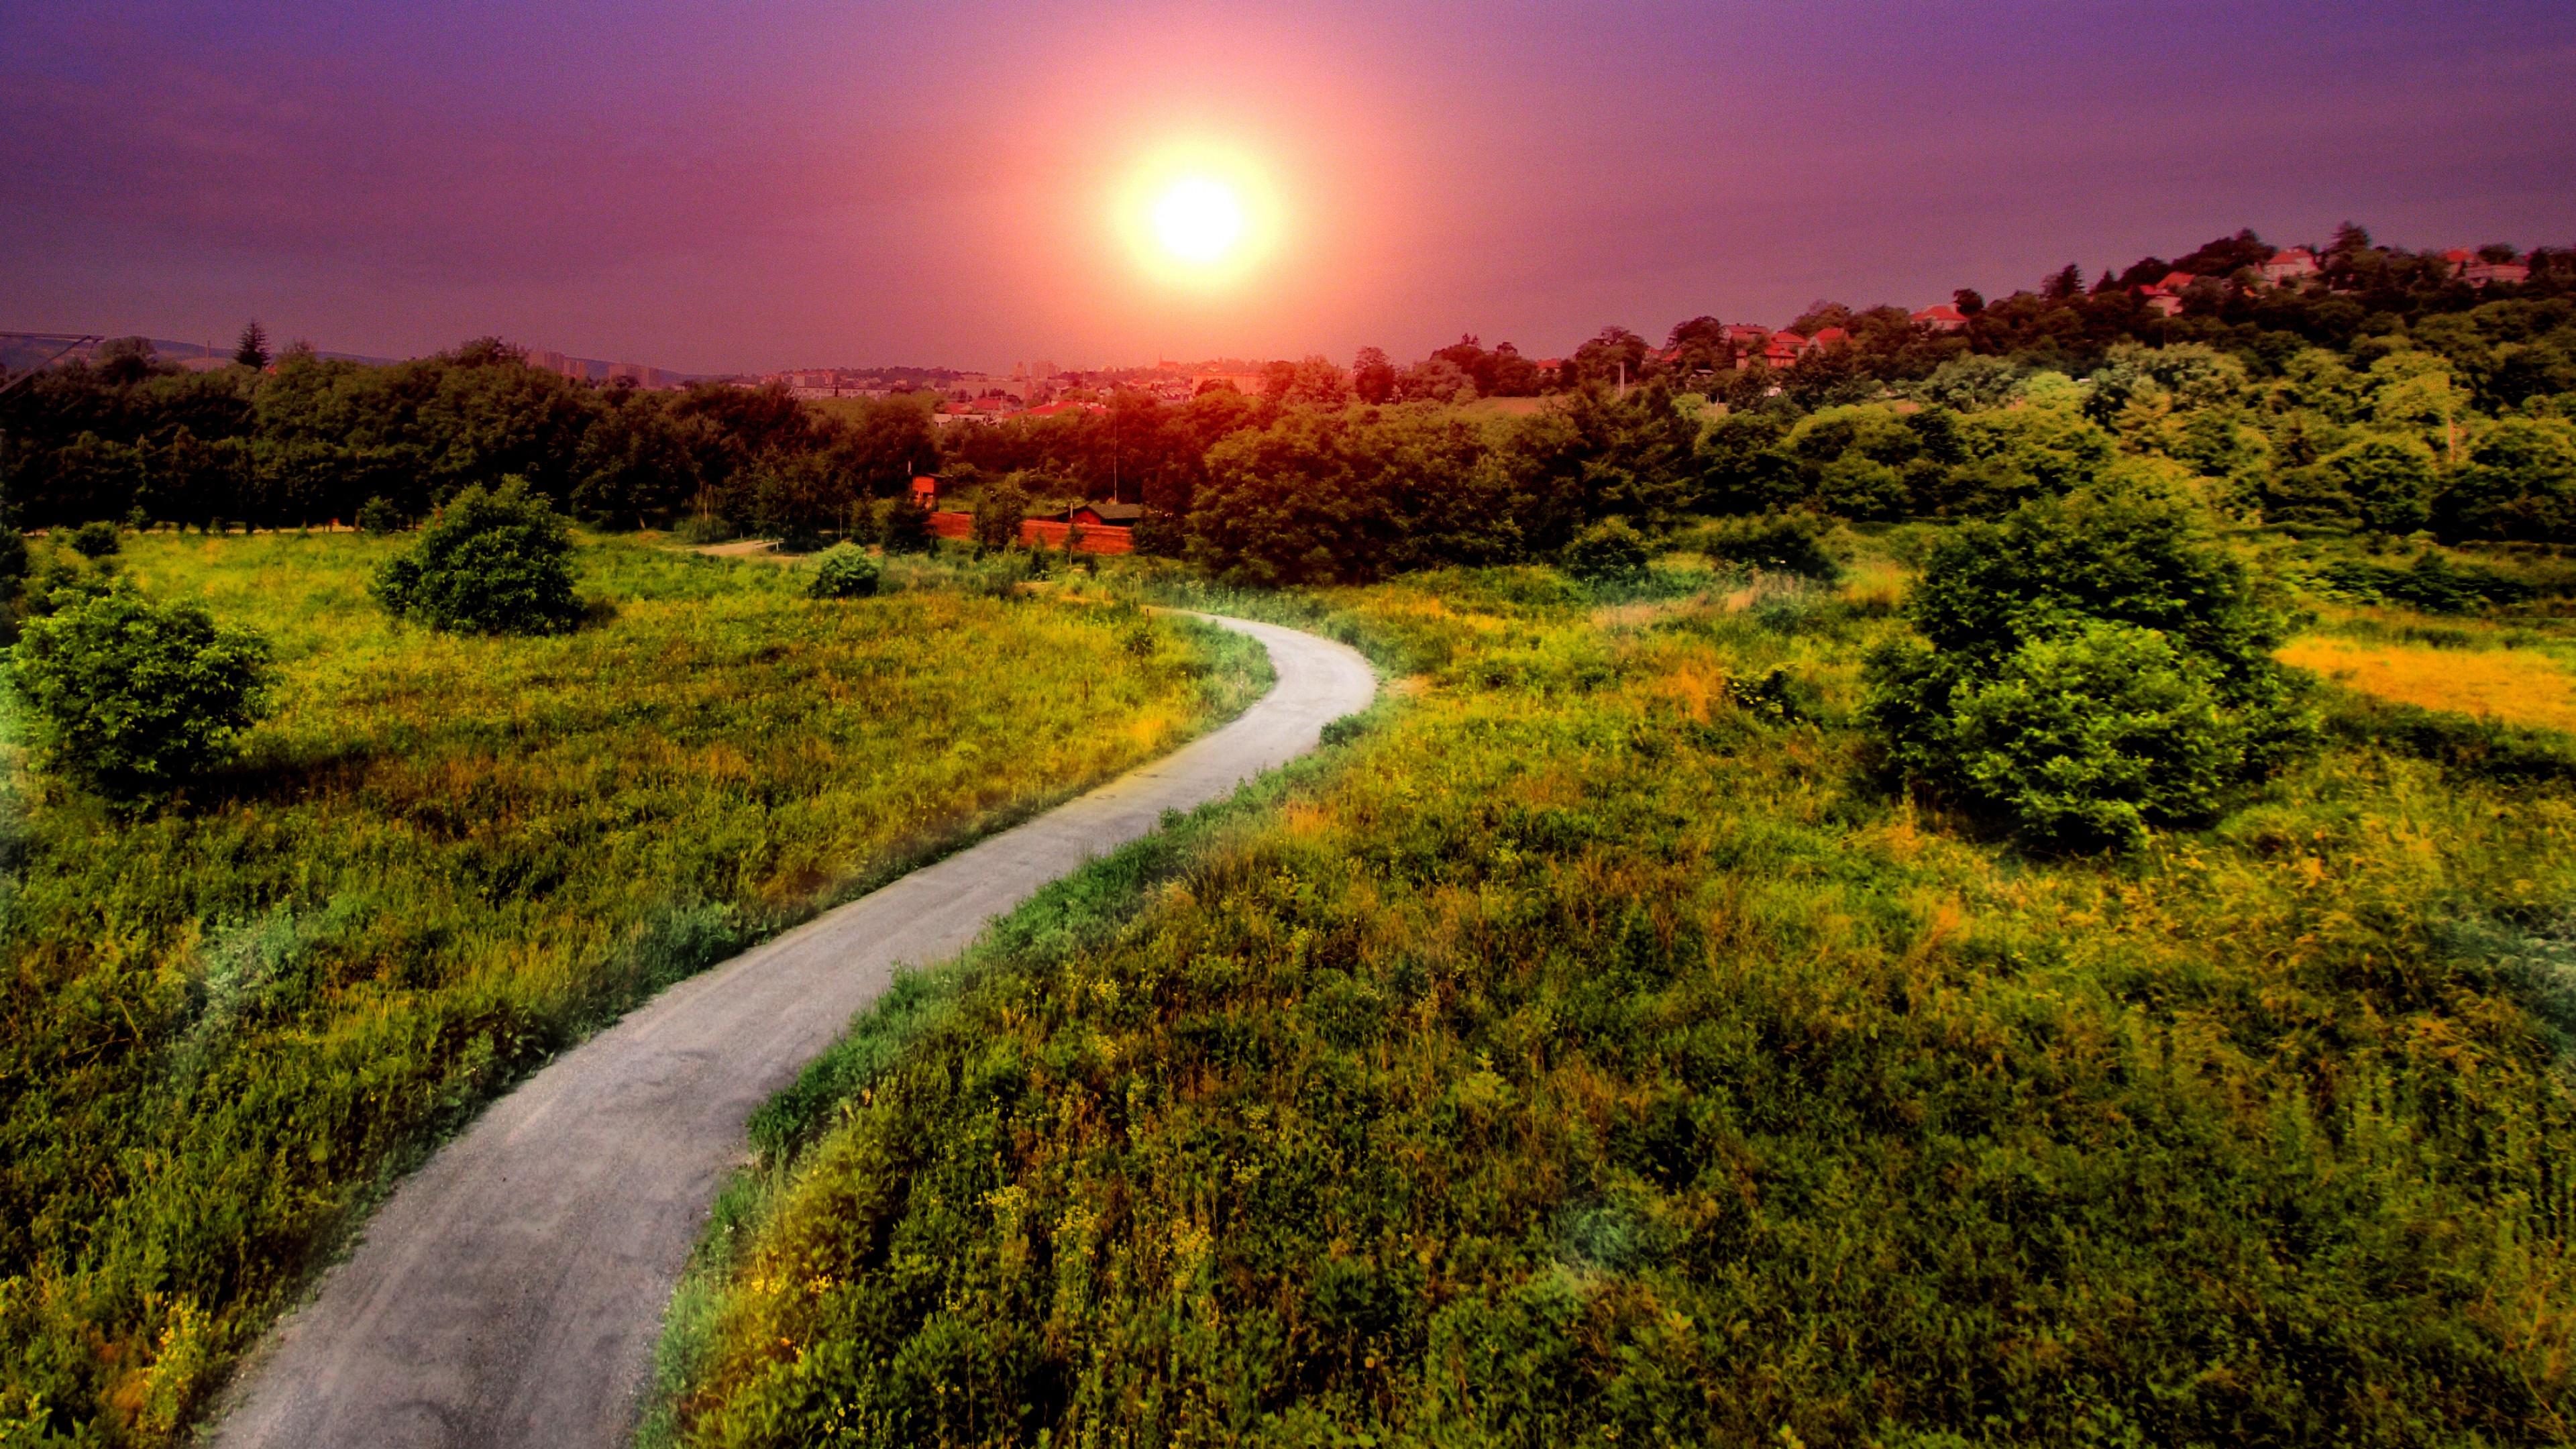 Wallpaper Pathway, Bright sun, Summer, HD, Nature, #2654